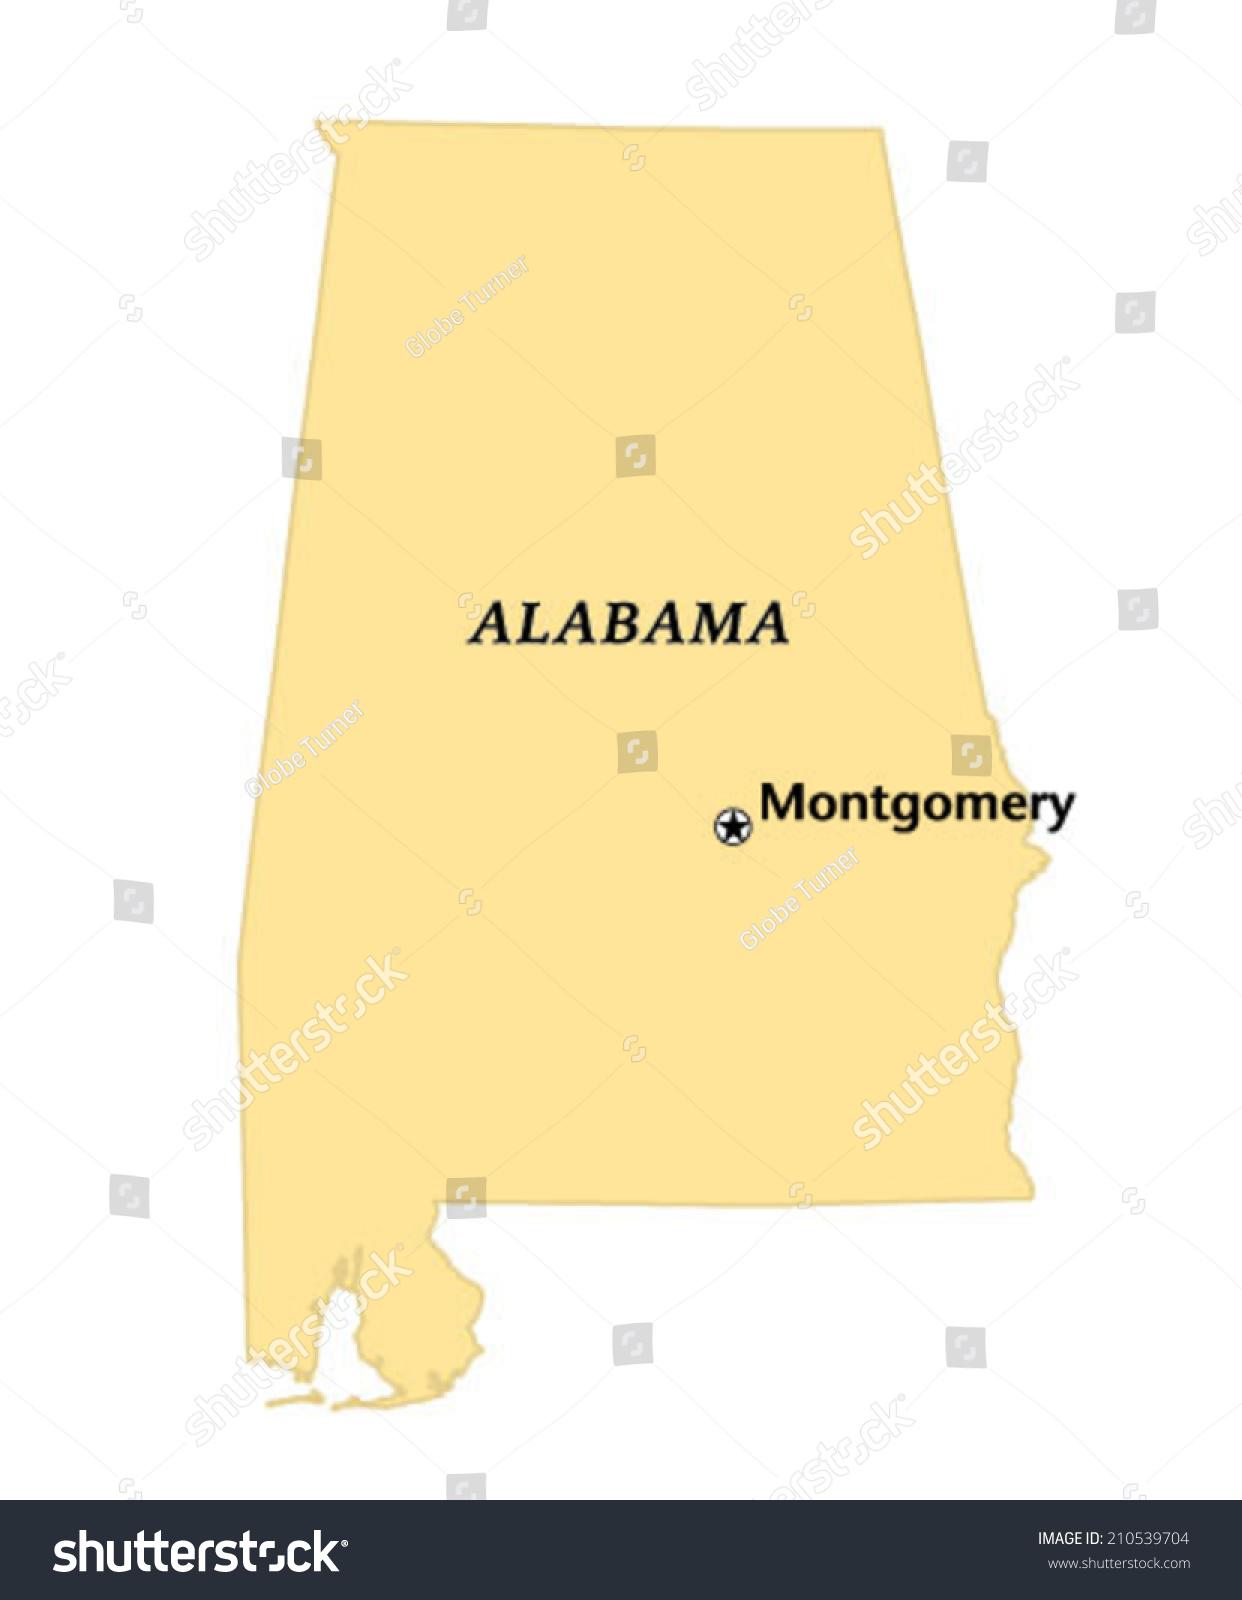 Montgomery Alabama Locate Map Stock Vector Shutterstock - Montgomery al map